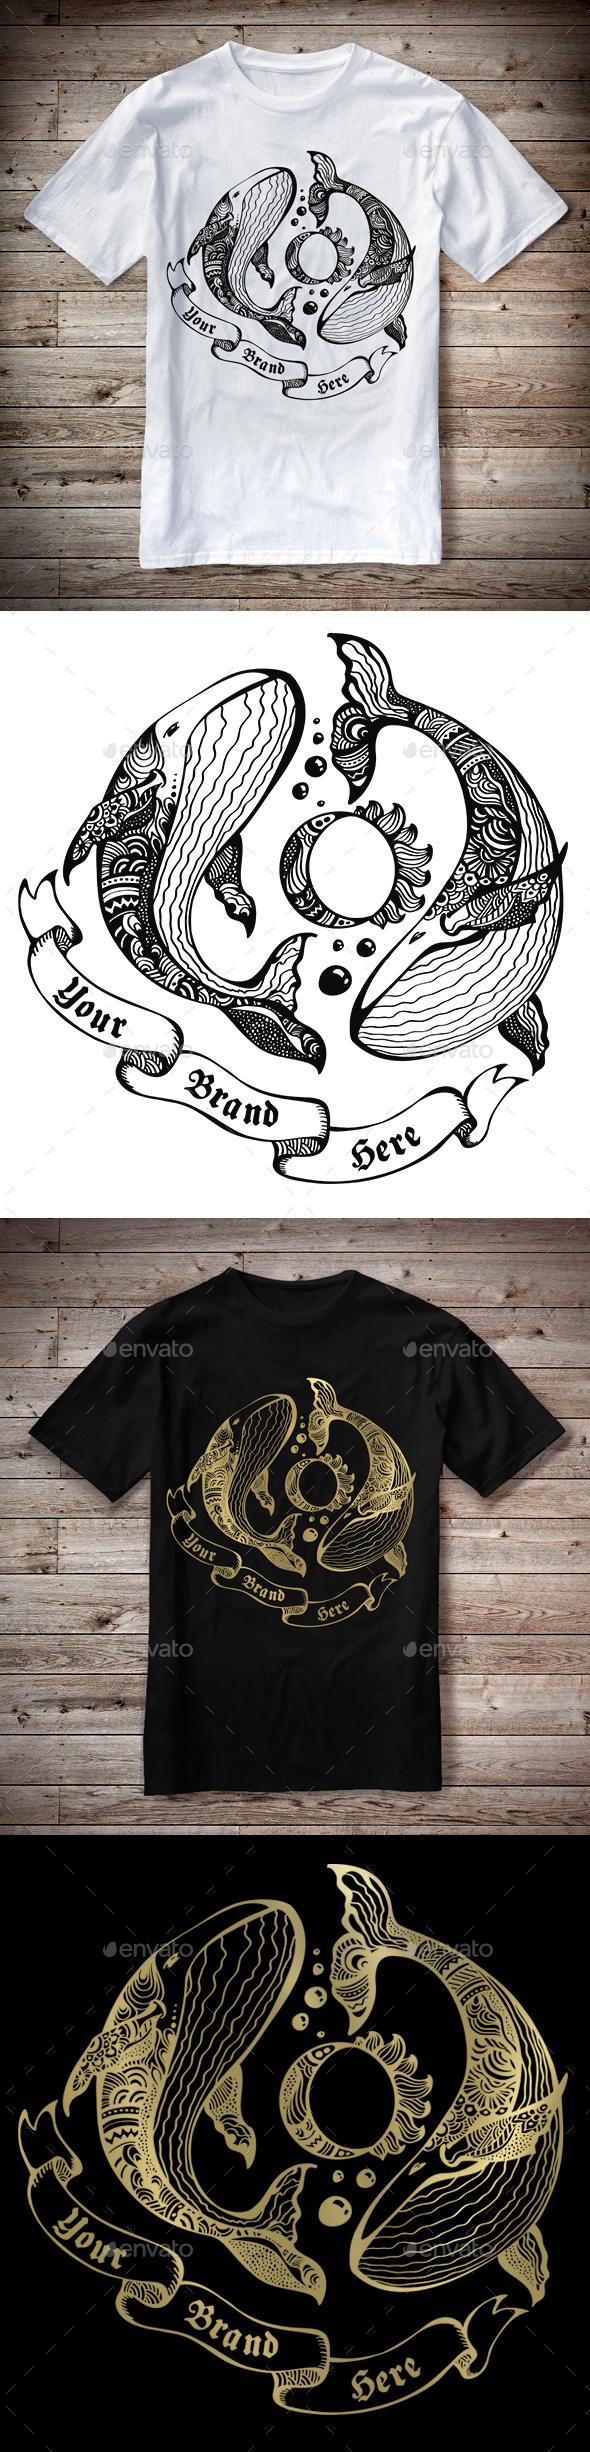 T-Shirt Illustration Whales Theme - T-Shirts